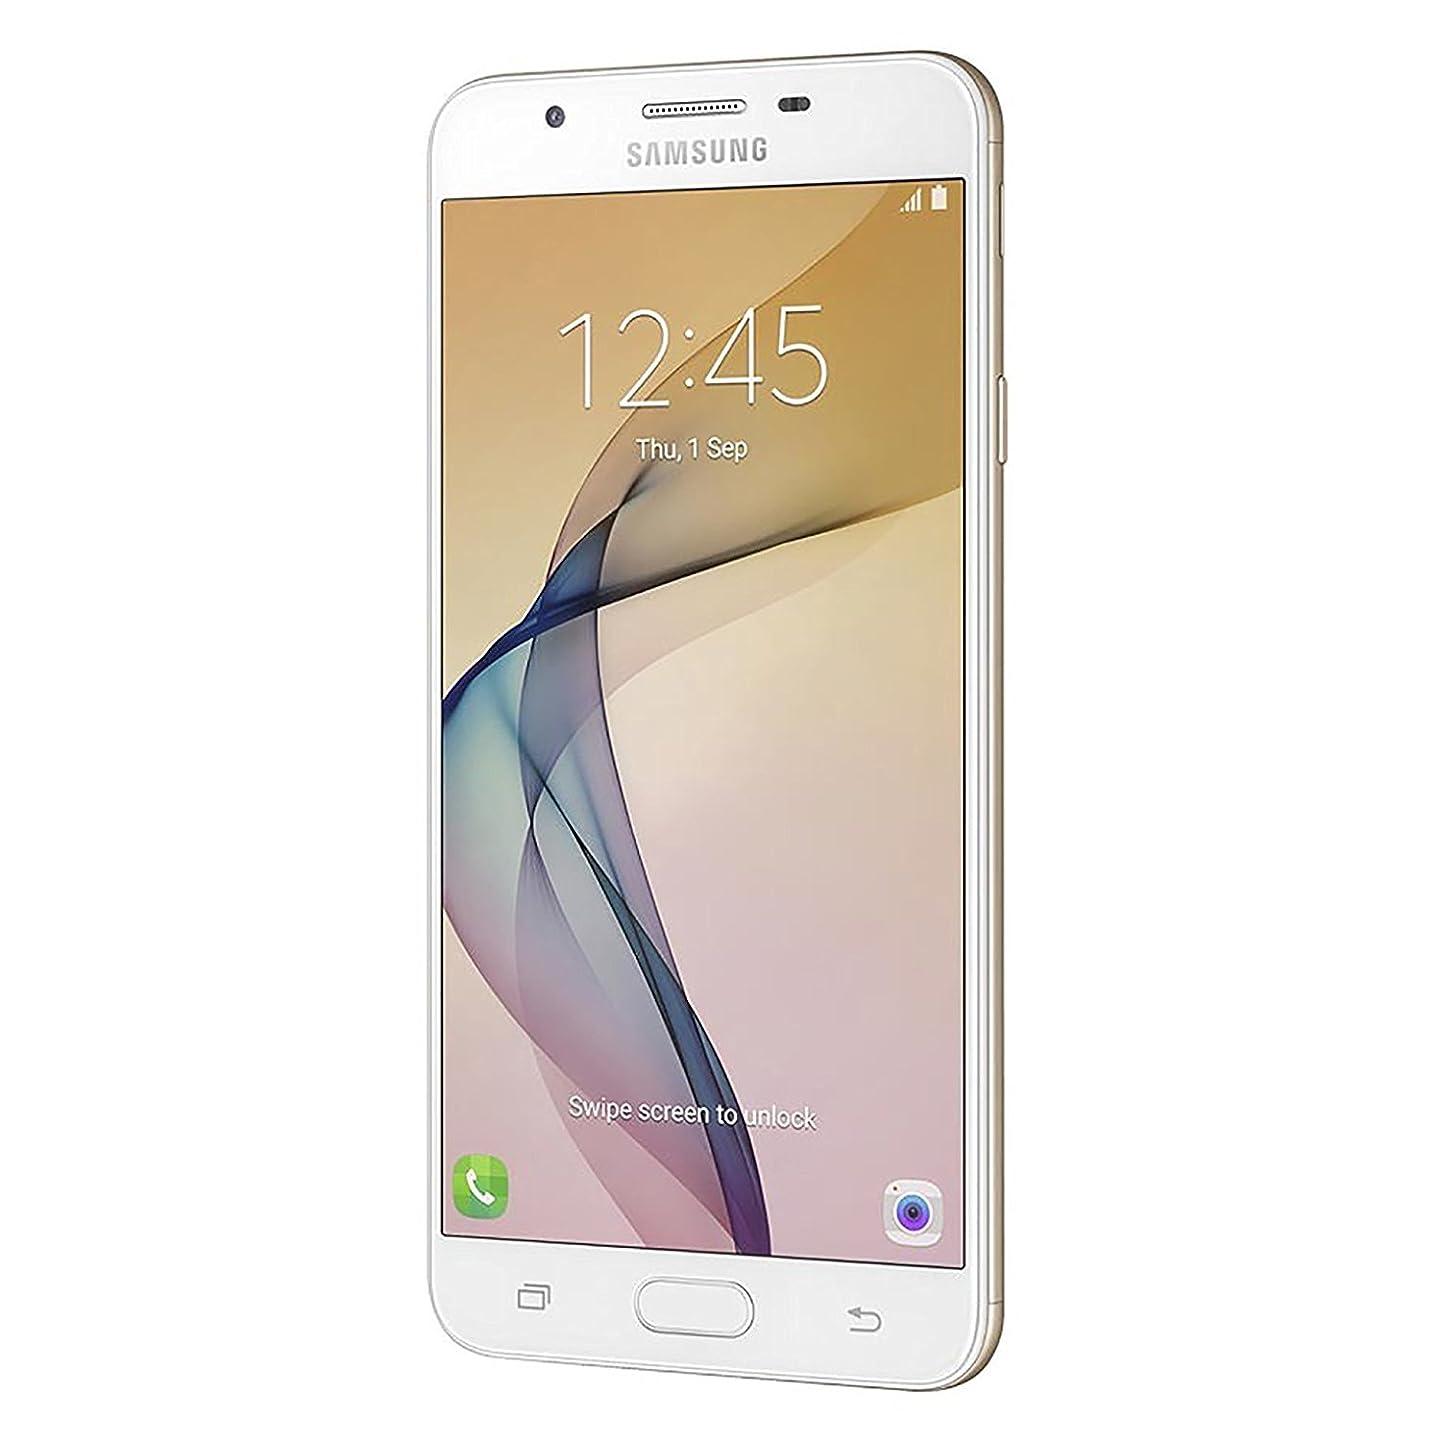 Samsung Galaxy J7 Prime (16GB) G610M/DS Dual SIM Unlocked w/Finger Print Scanner (Latin & US 4G LTE) (White Gold)